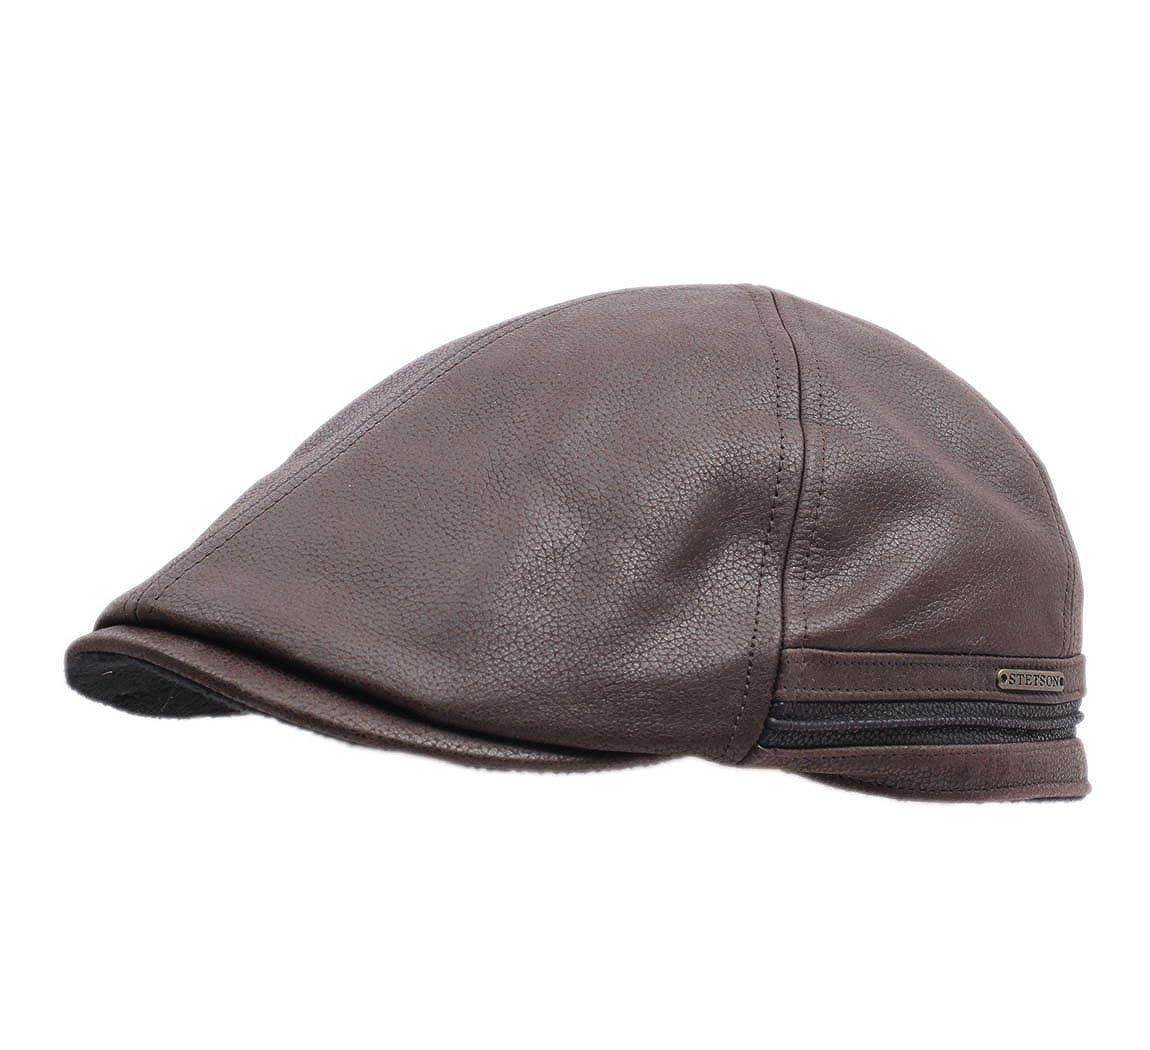 Stetson Men s Redding Leather Flat Cap at Amazon Men s Clothing store  7d14270fefe5